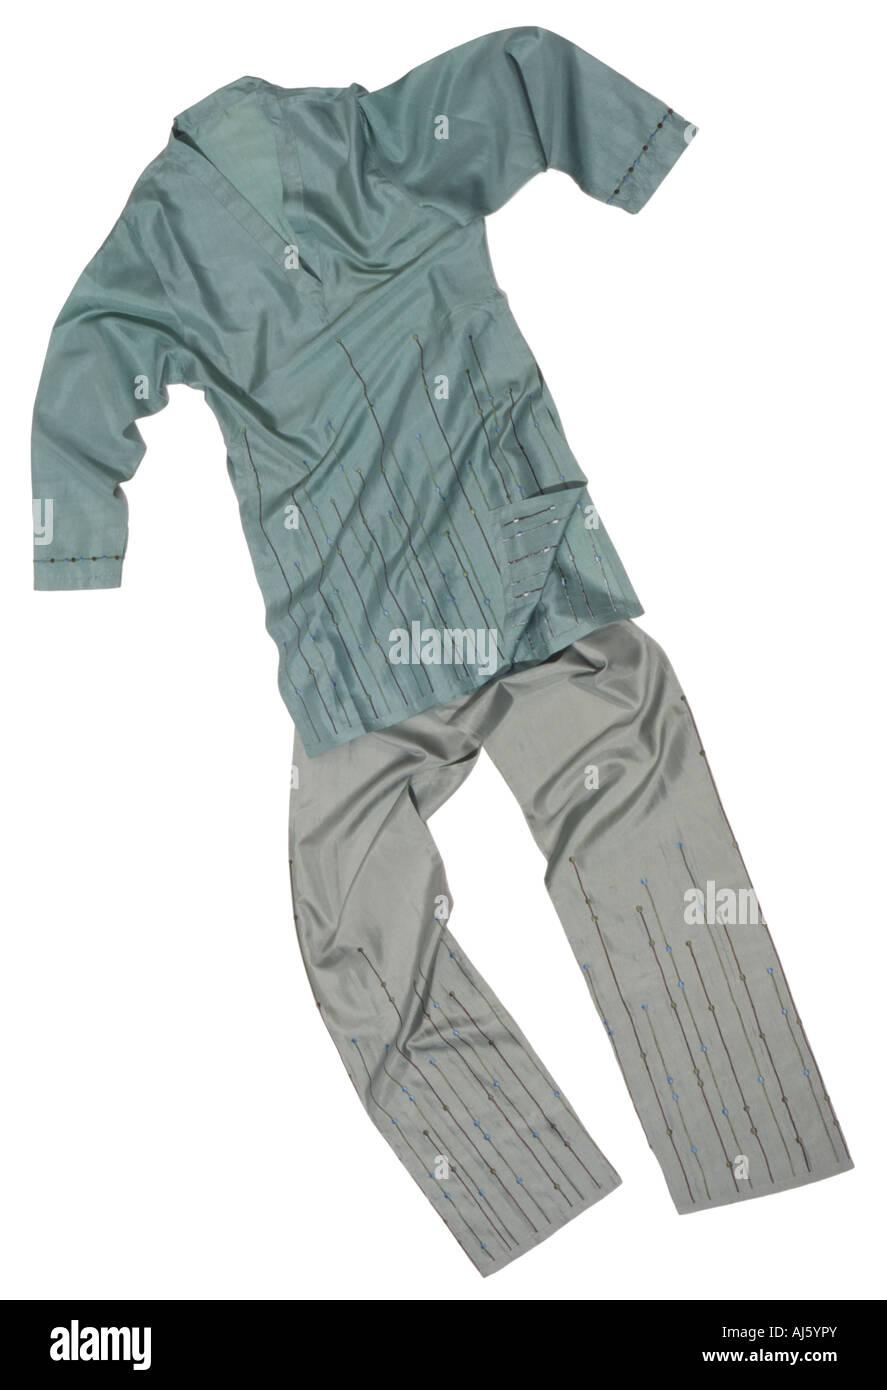 silk nightwear - Stock Image